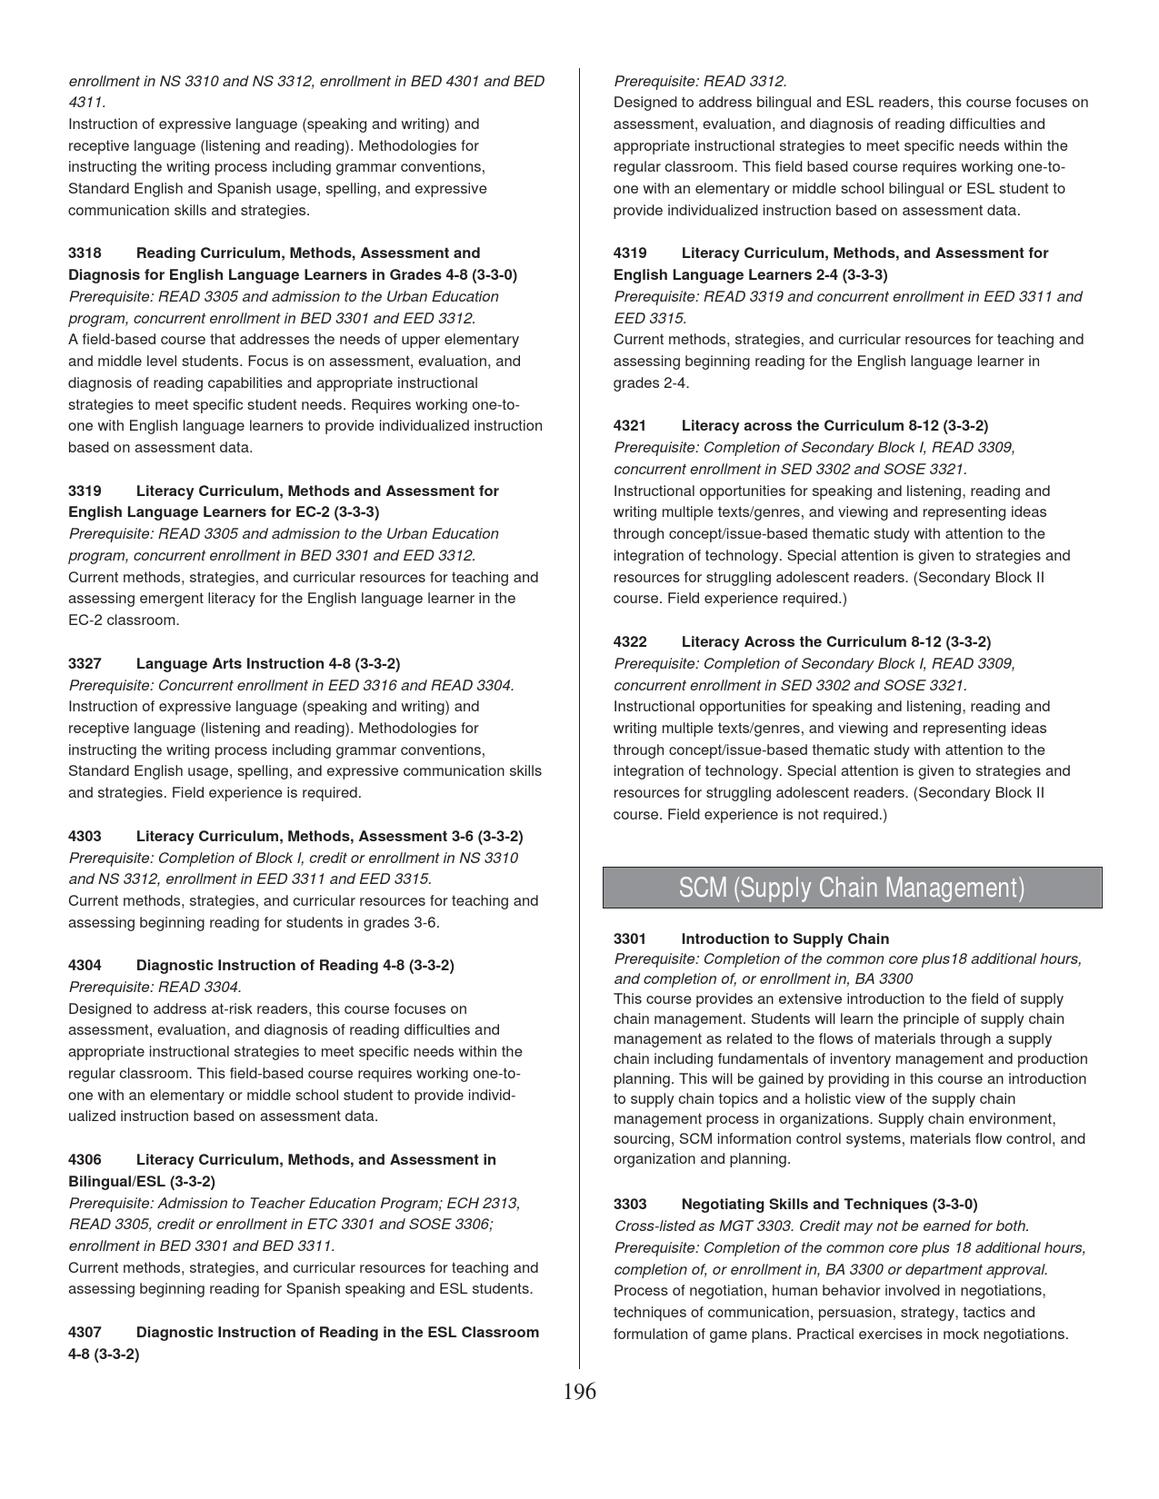 UHD Catalog 2012/2013 by University of Houston-Downtown - issuu